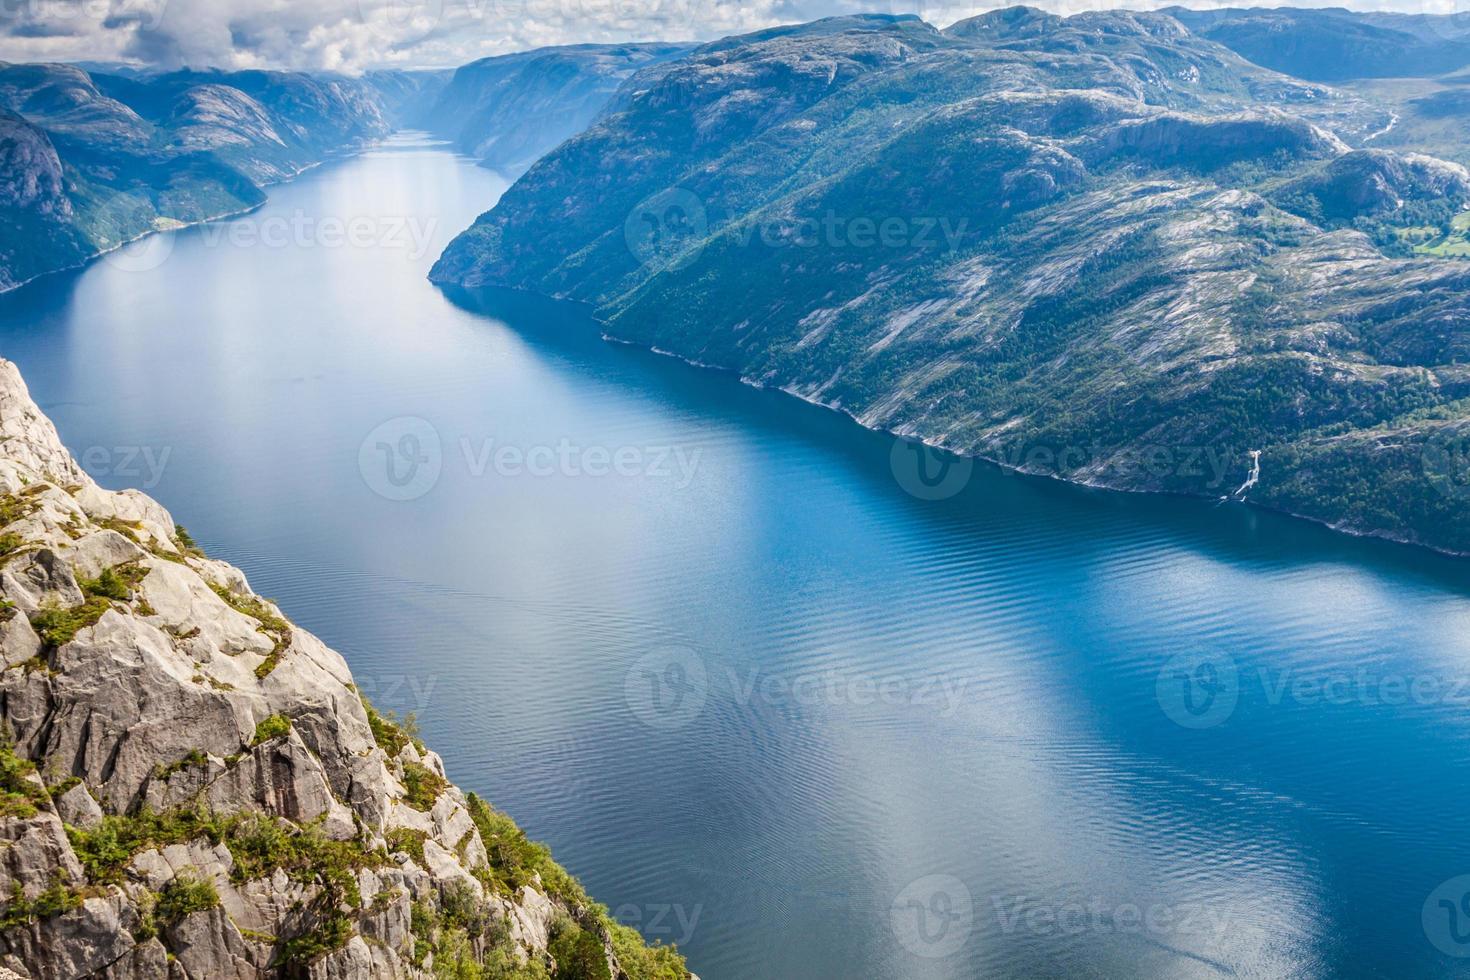 preikestolen, prekestolen vid lysefjorden (norge). en välkänd t foto